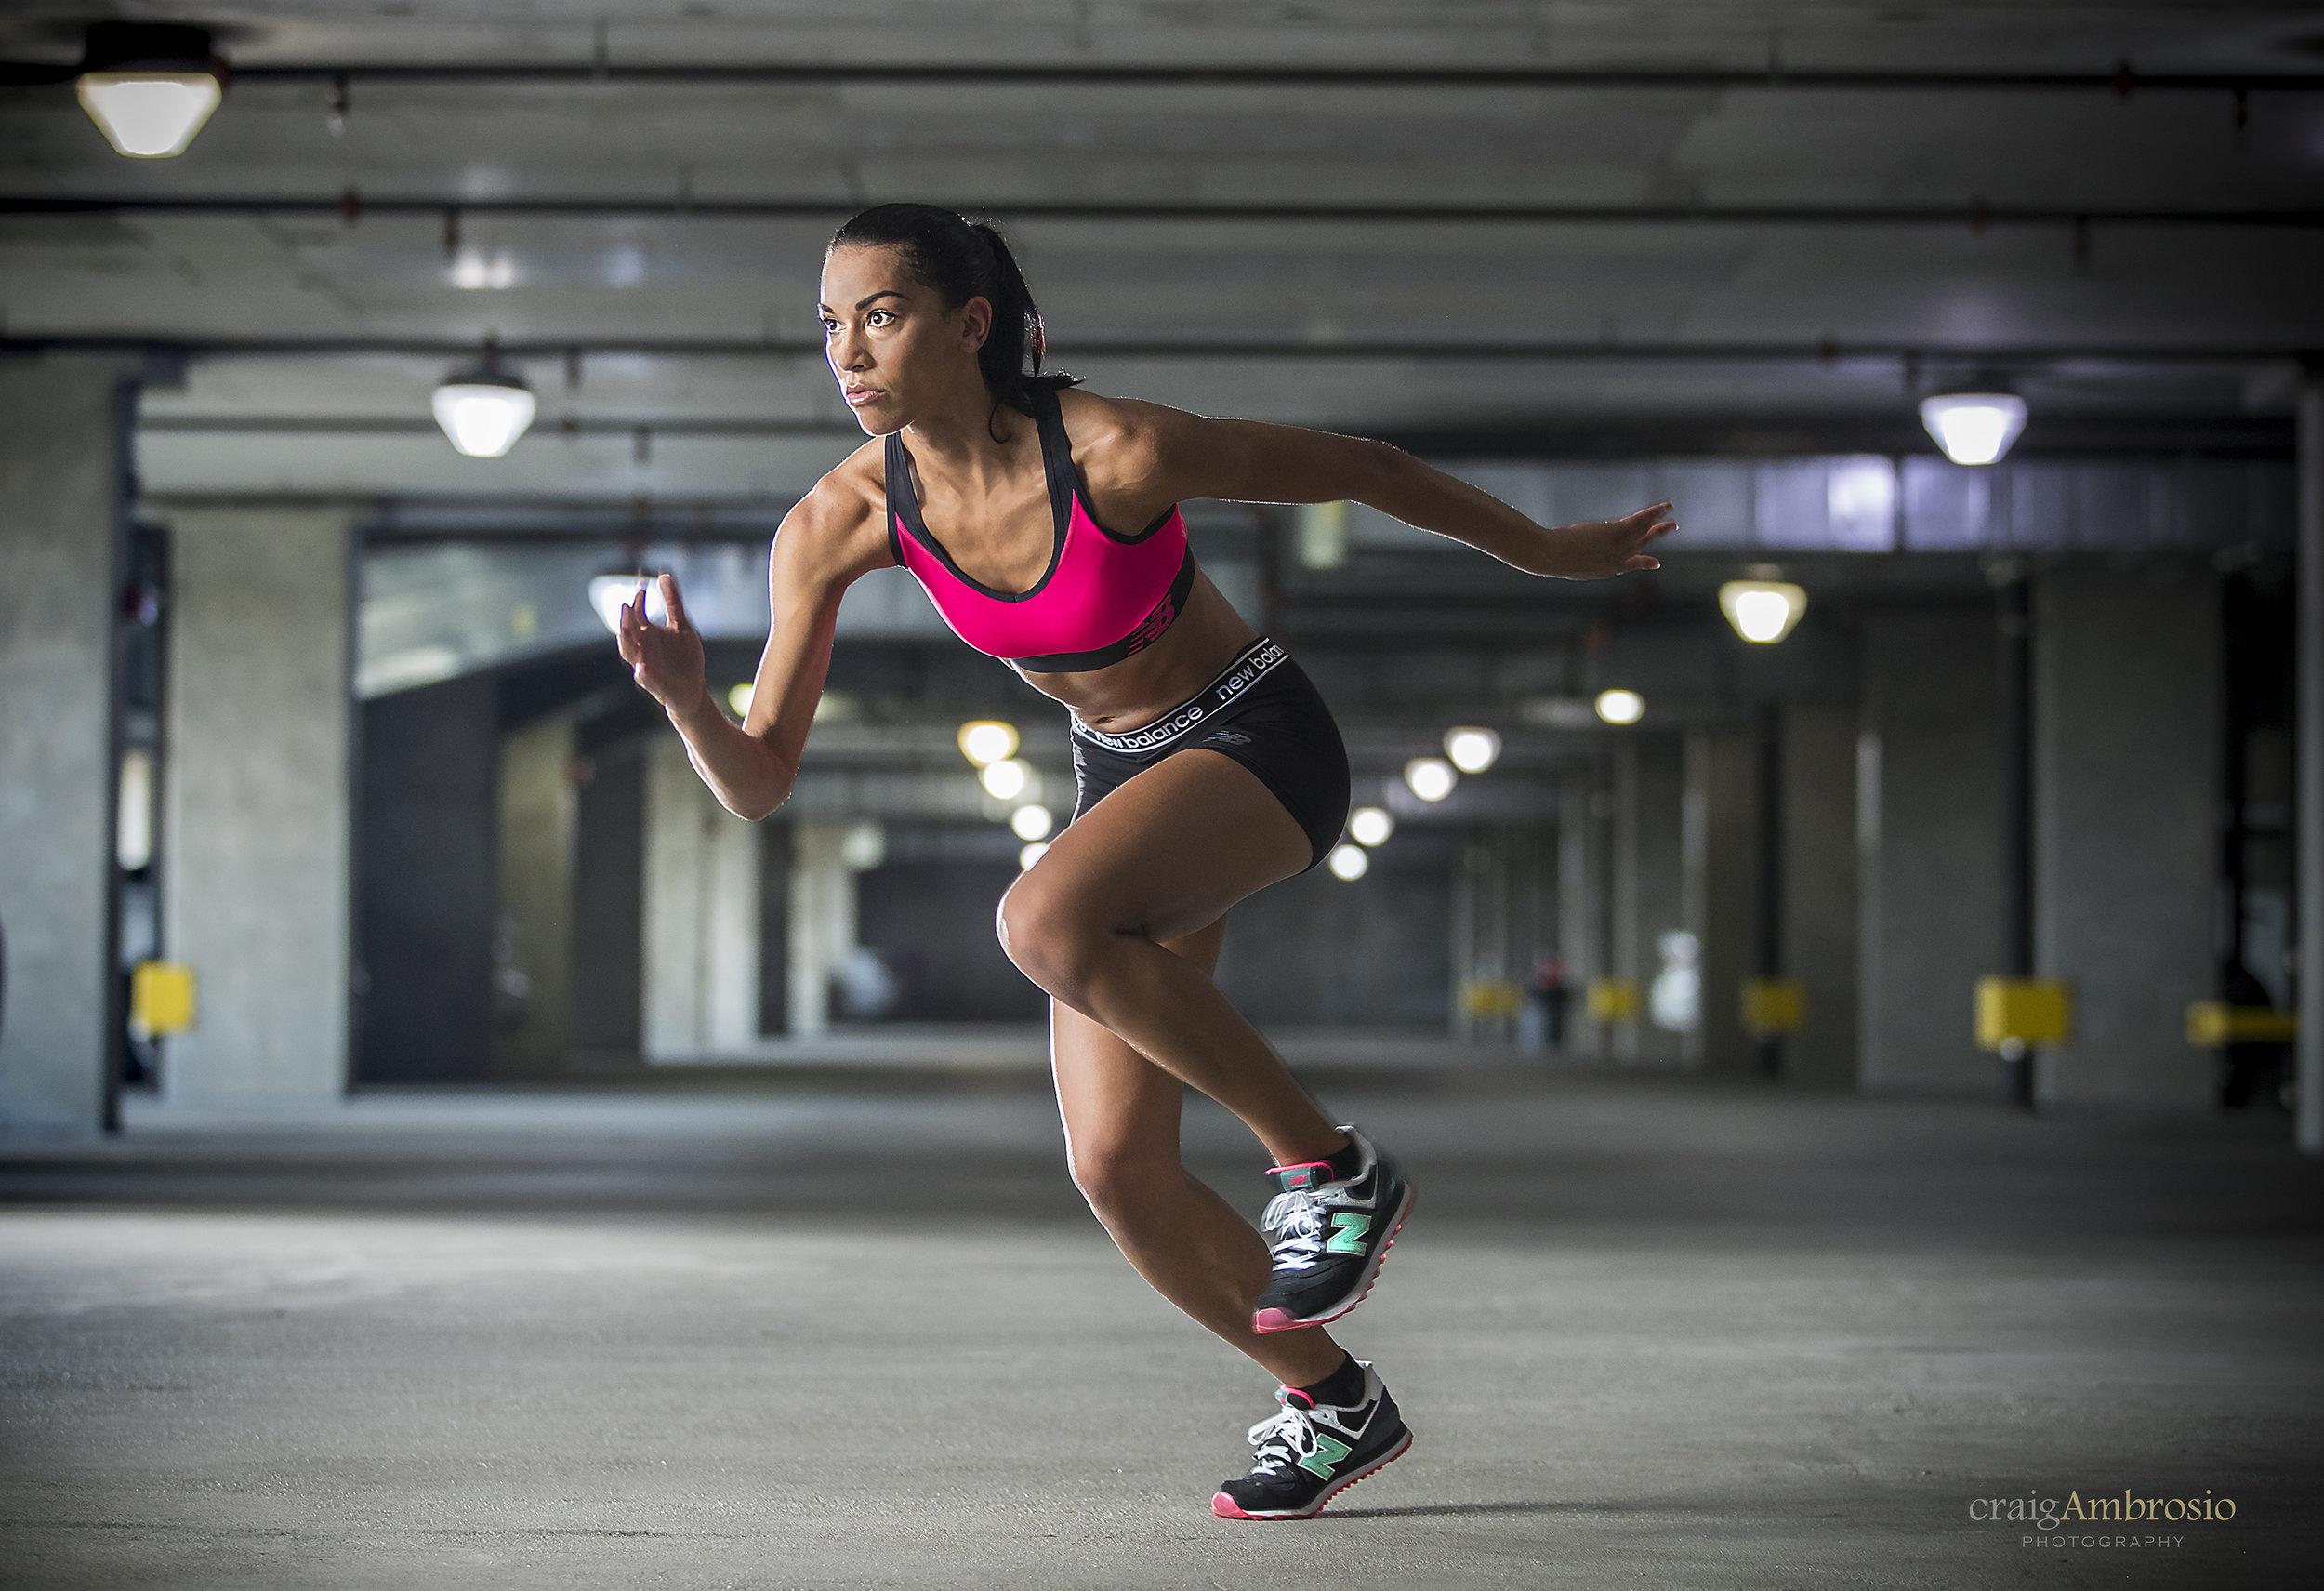 Craig Ambrosio Photography—New Balance Fitness Shoot